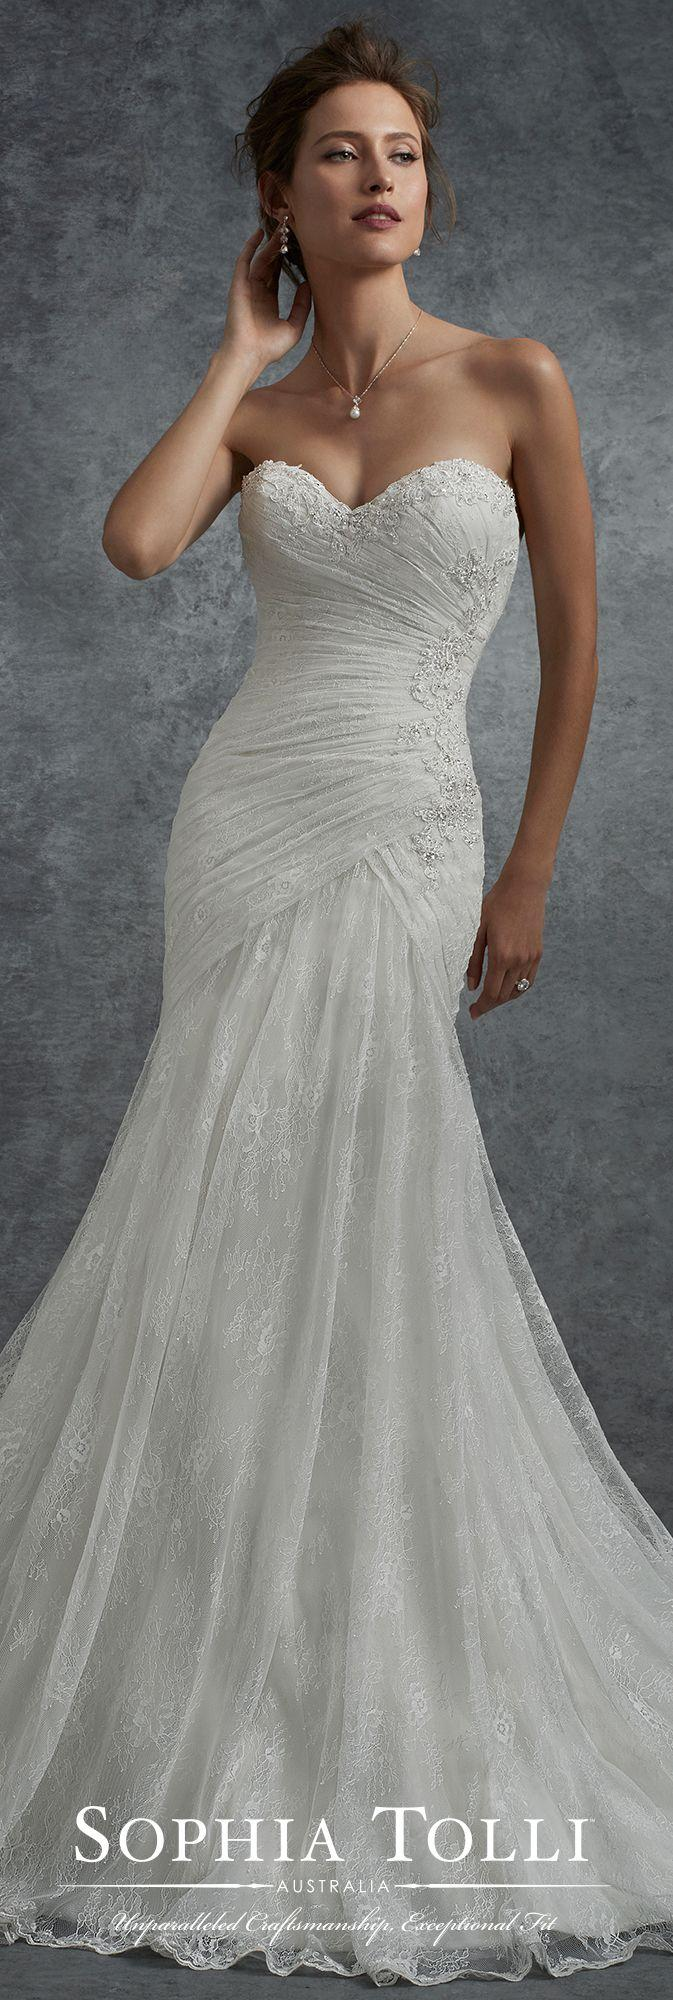 Mariage - Strapless Allover Lace Draped Bodice Wedding Dress - Sophia Tolli Y21754